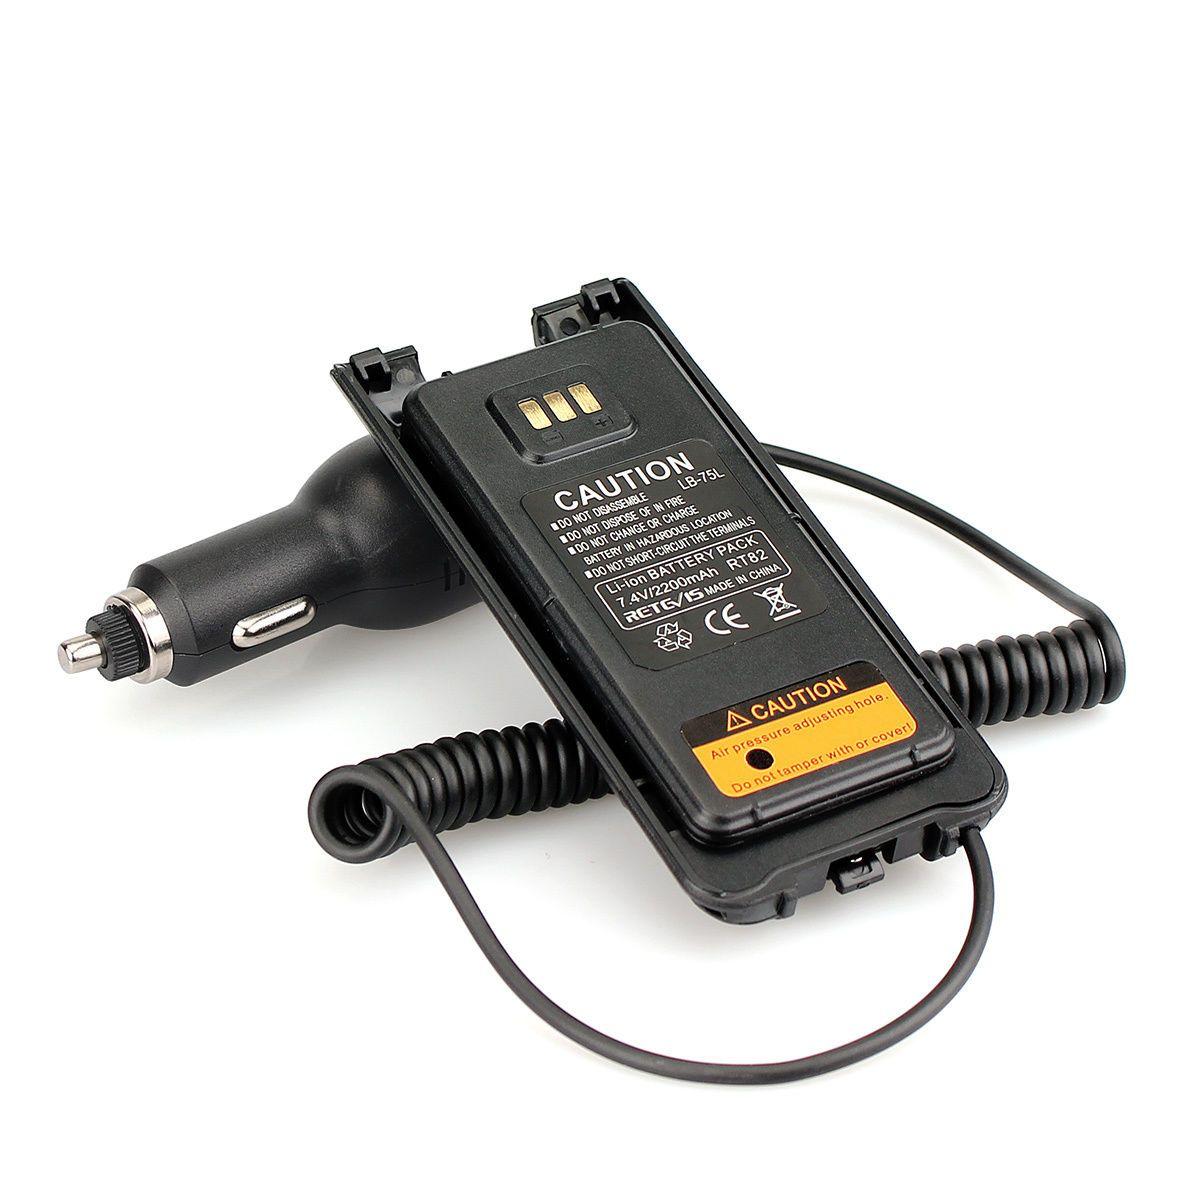 Retevis RT82 Radyo Hoparlör Mic + Araç Radyo Şarj Cihazı Pil Eliminator + Kulaklık